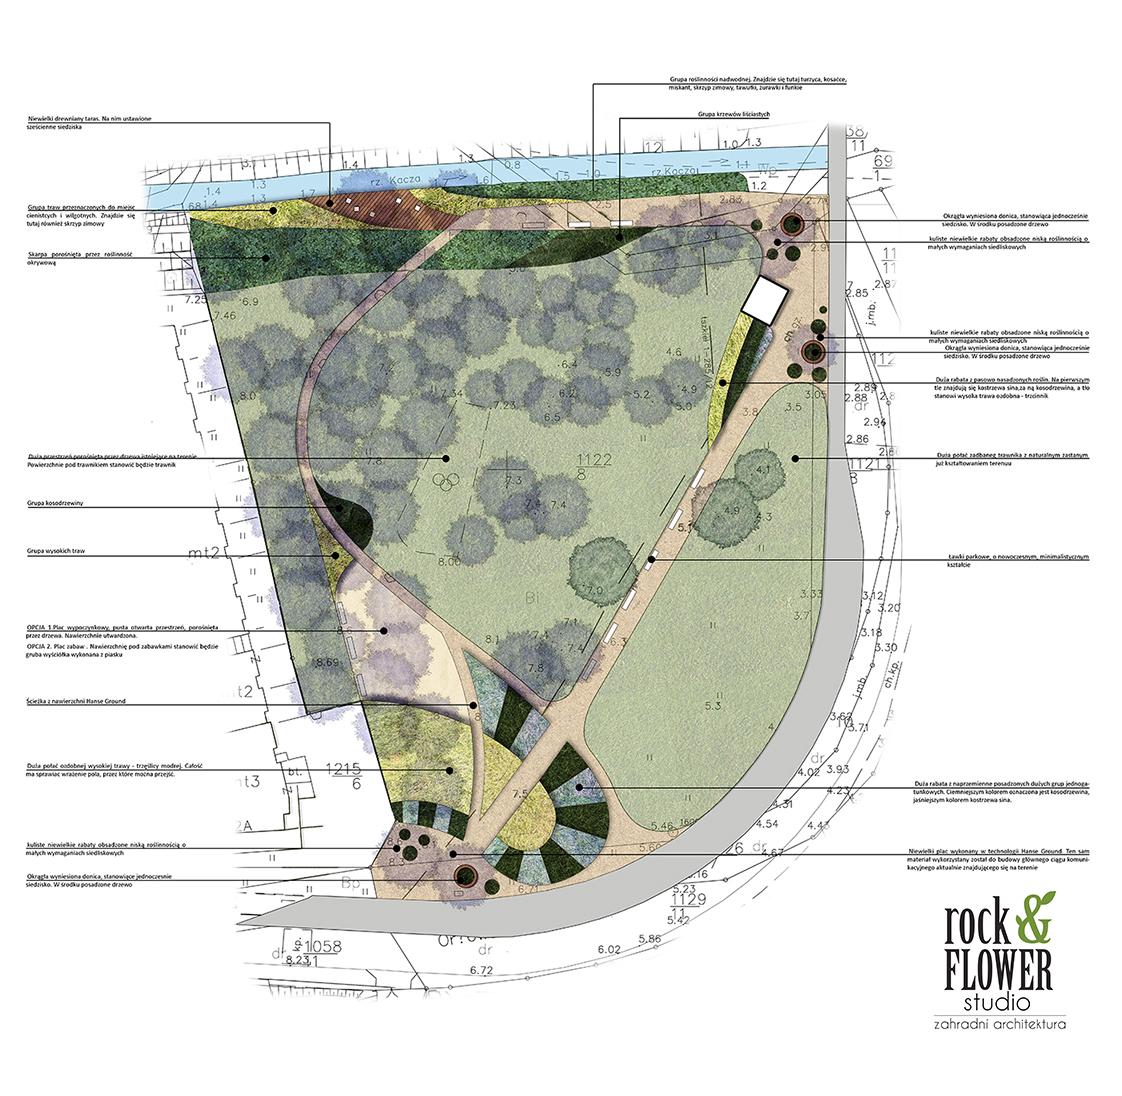 navhr-parku-projekt-public-mestsky-rock-and-flower-studio-praha